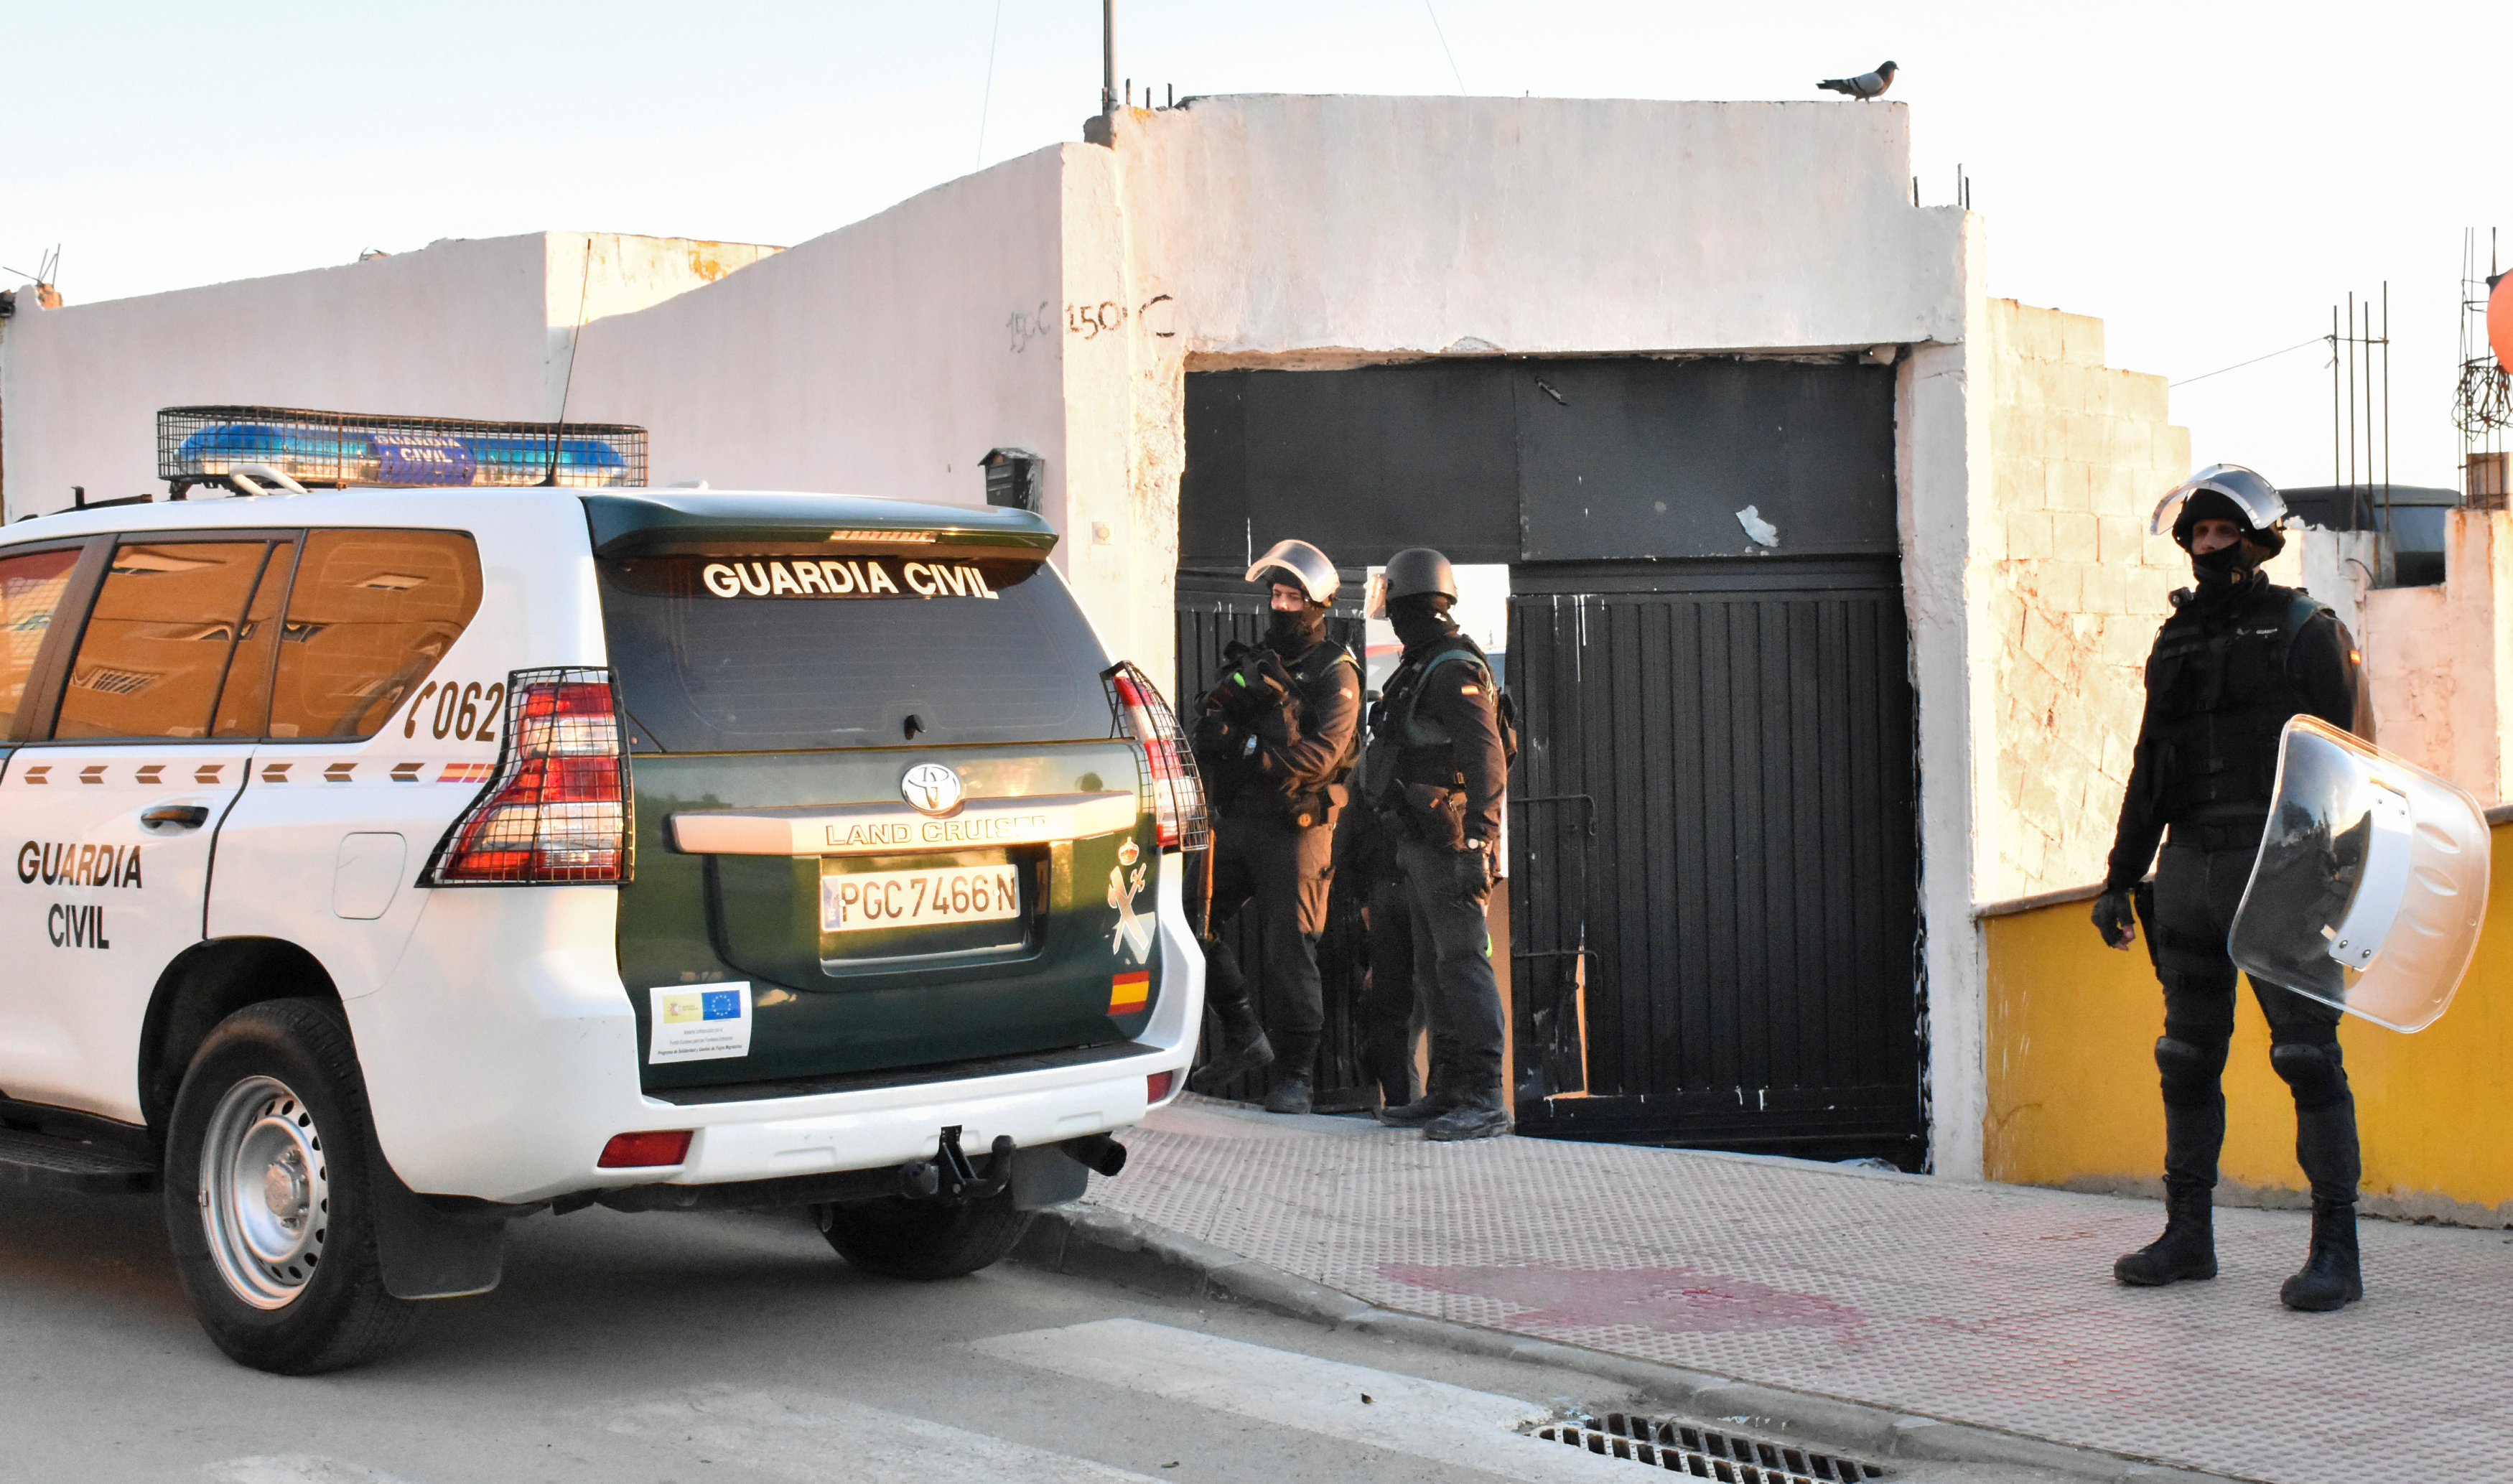 Spanish civil guards